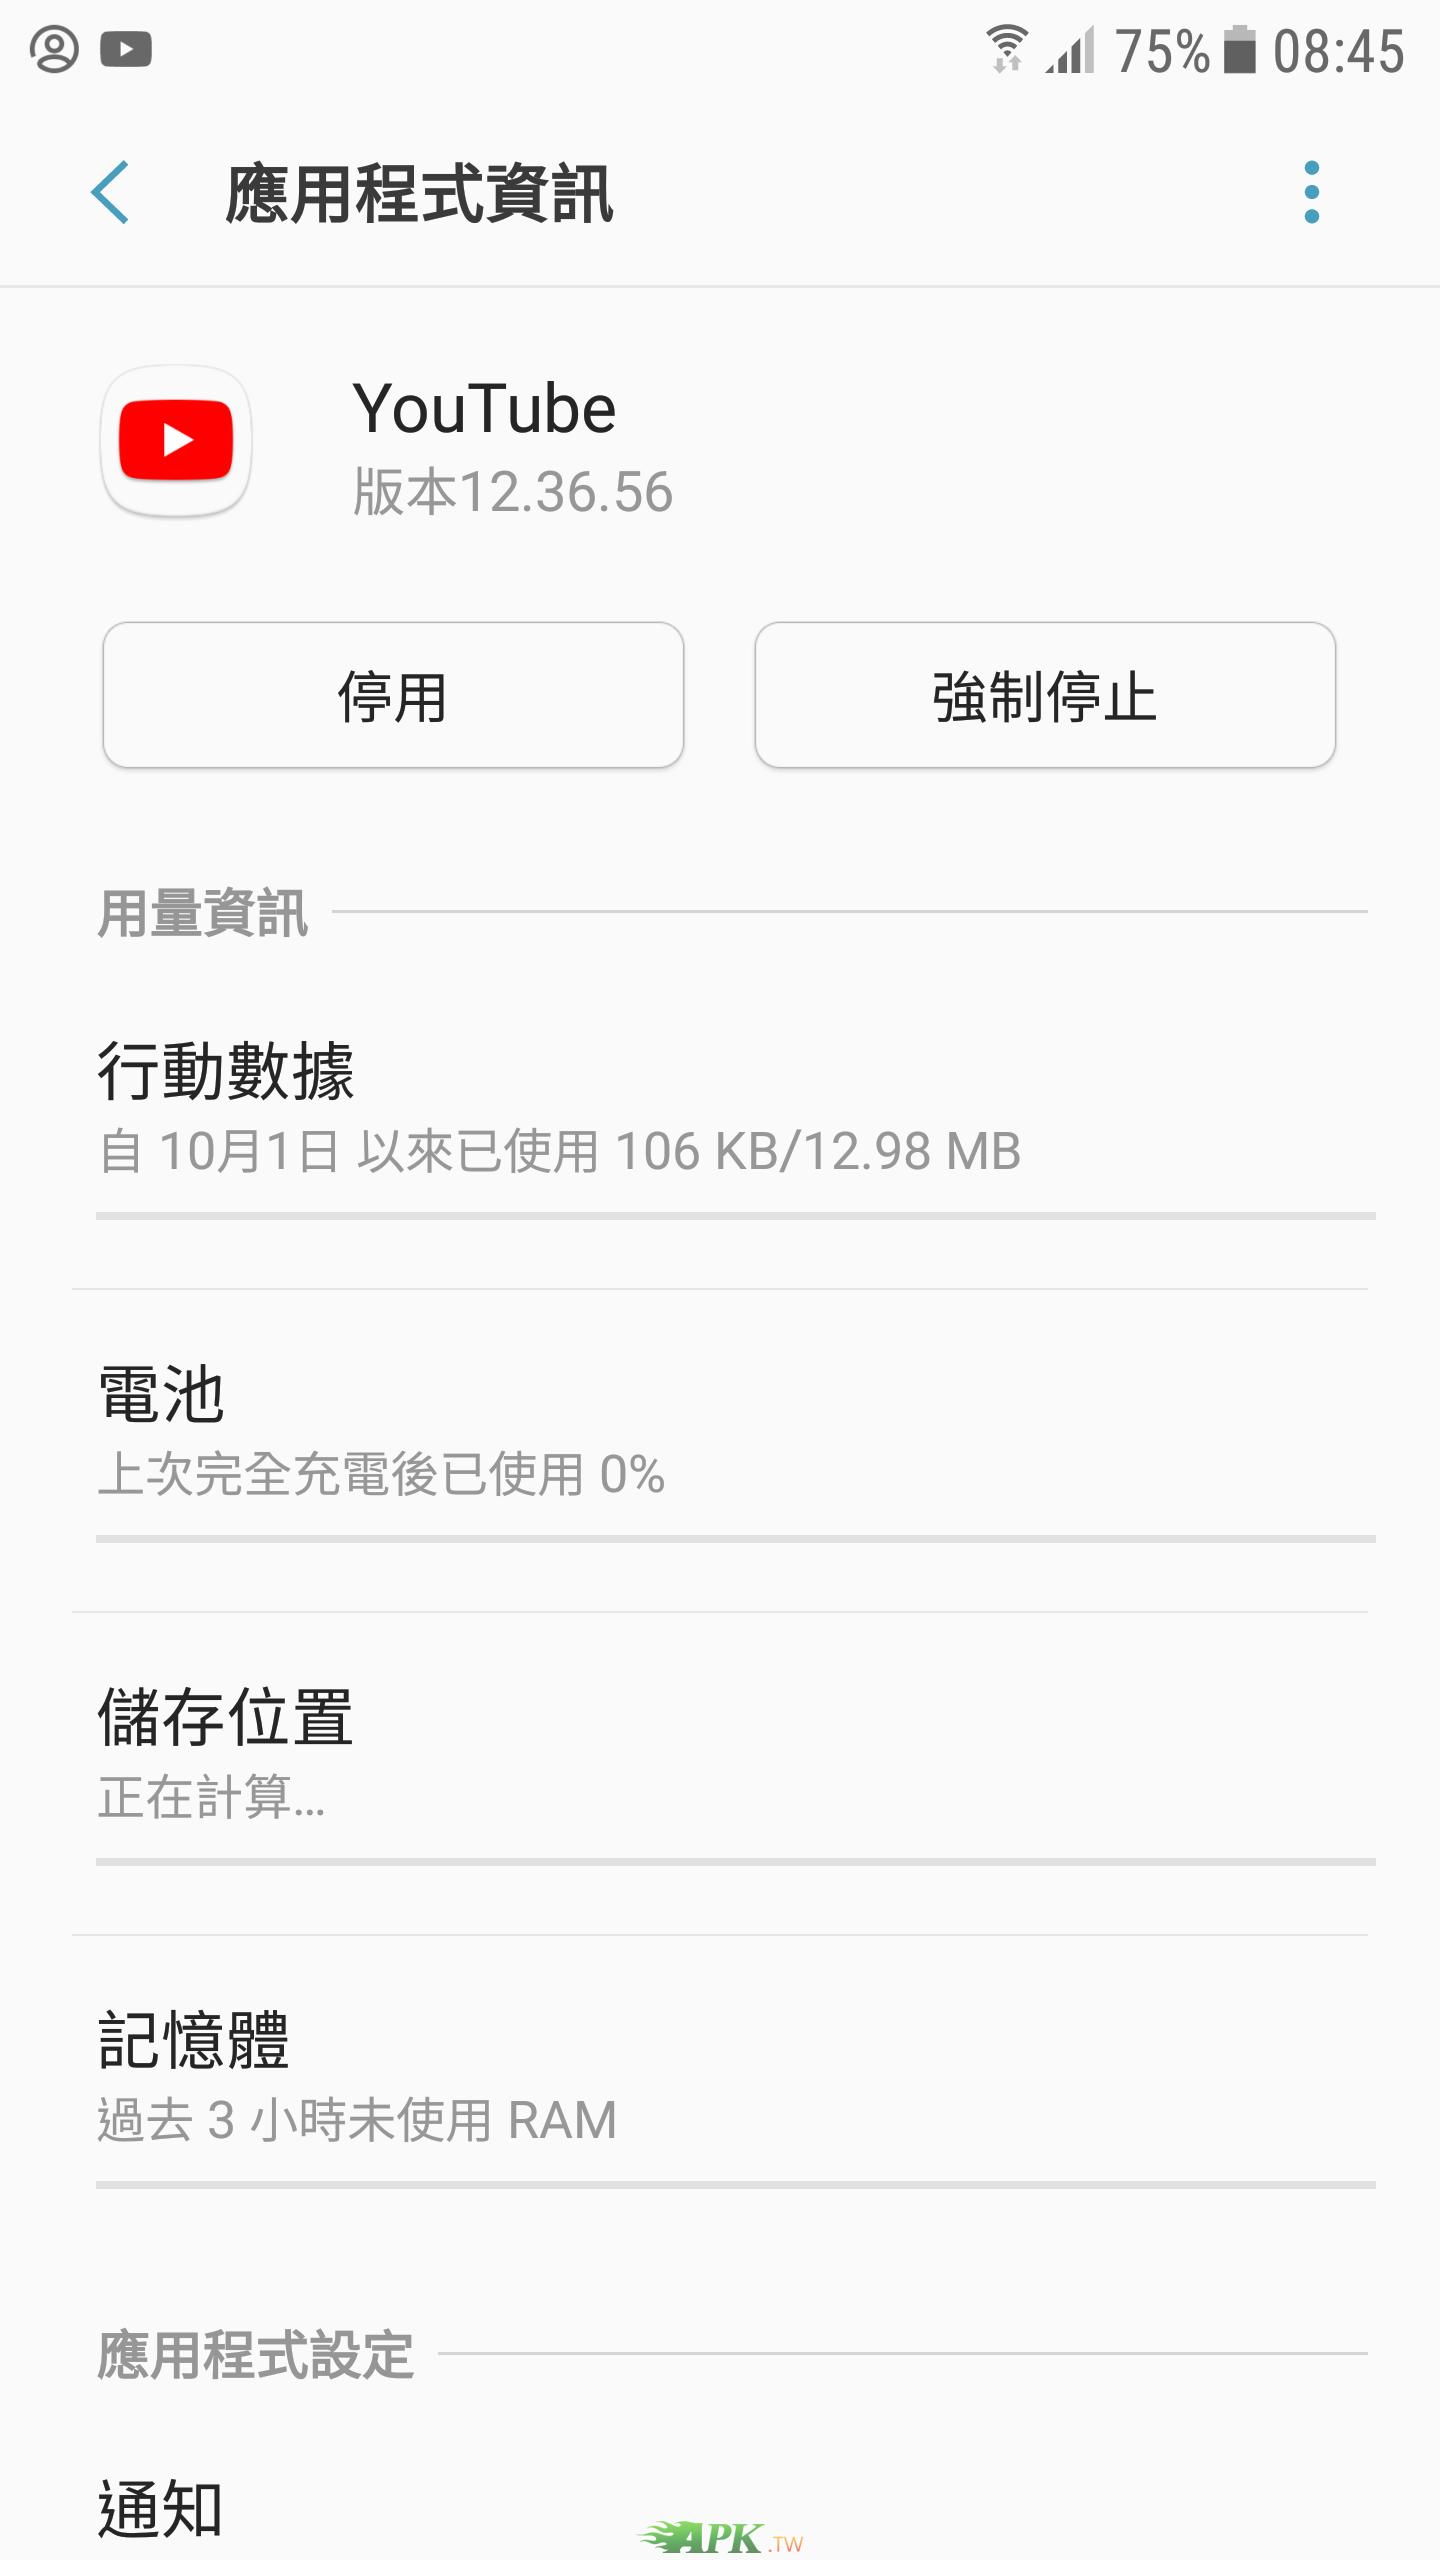 Screenshot_20171001-084512.png